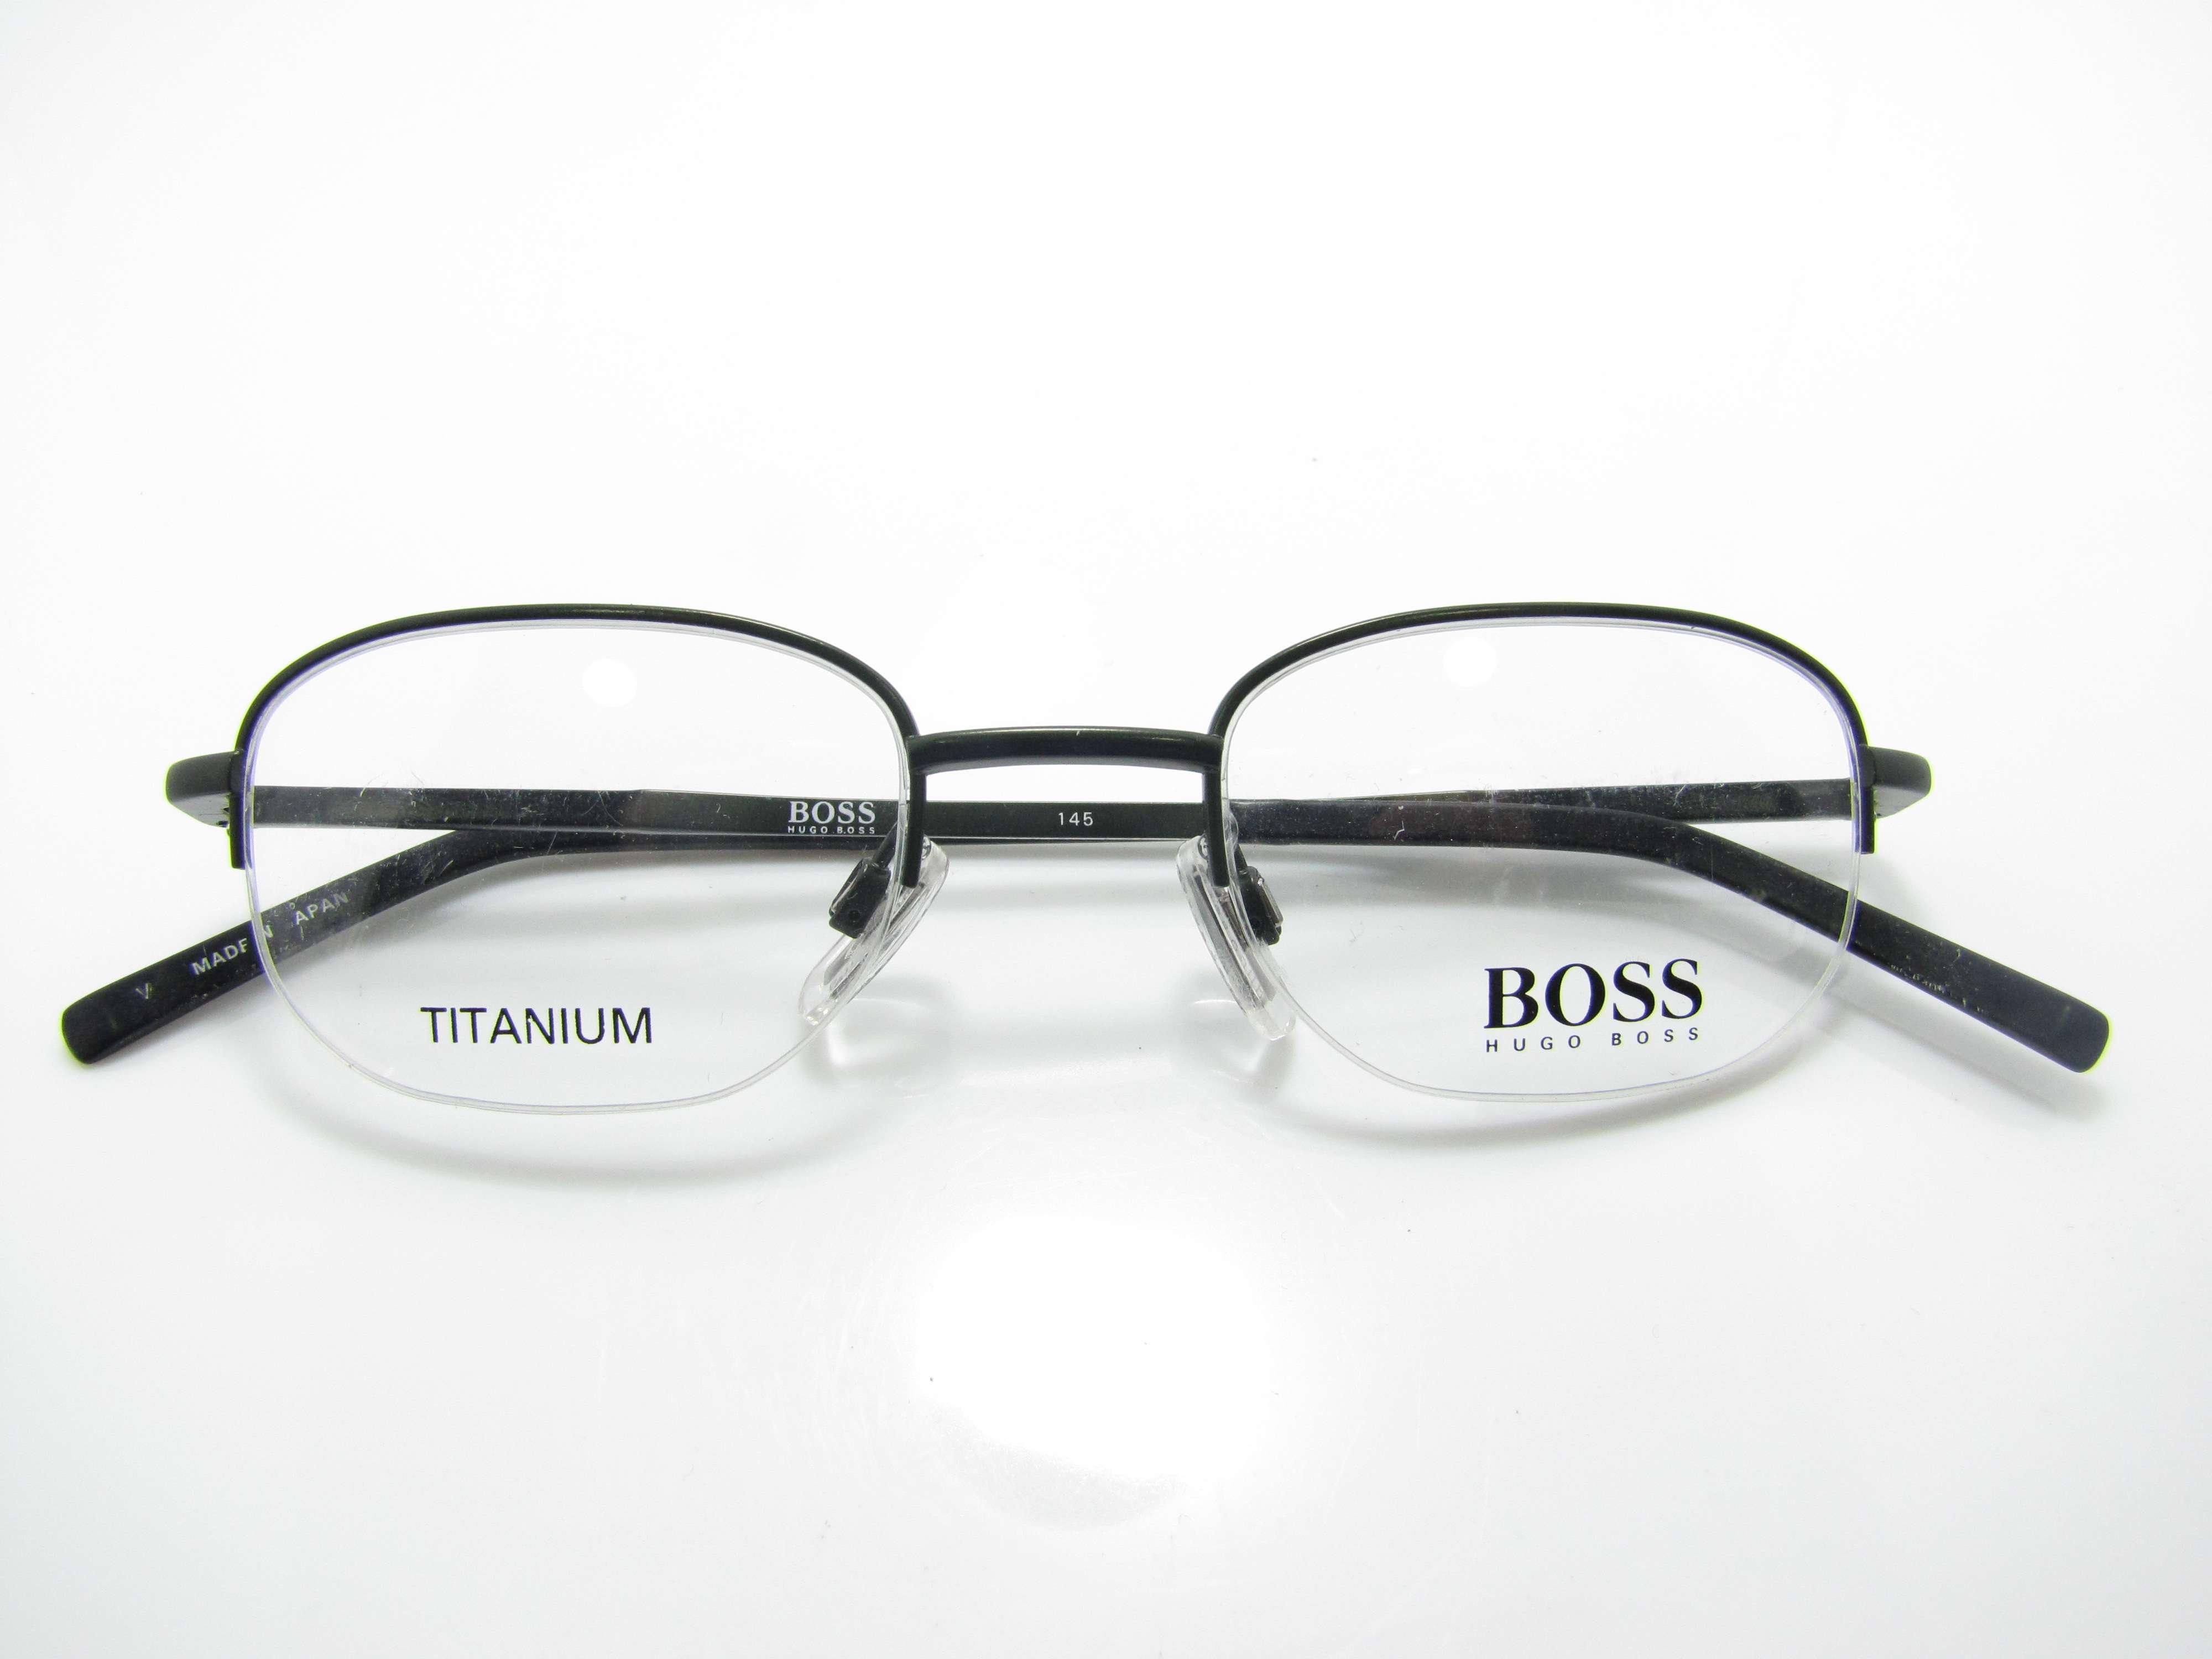 dfc21c28eb2f Ebay Hugo Boss Seeing Glasses